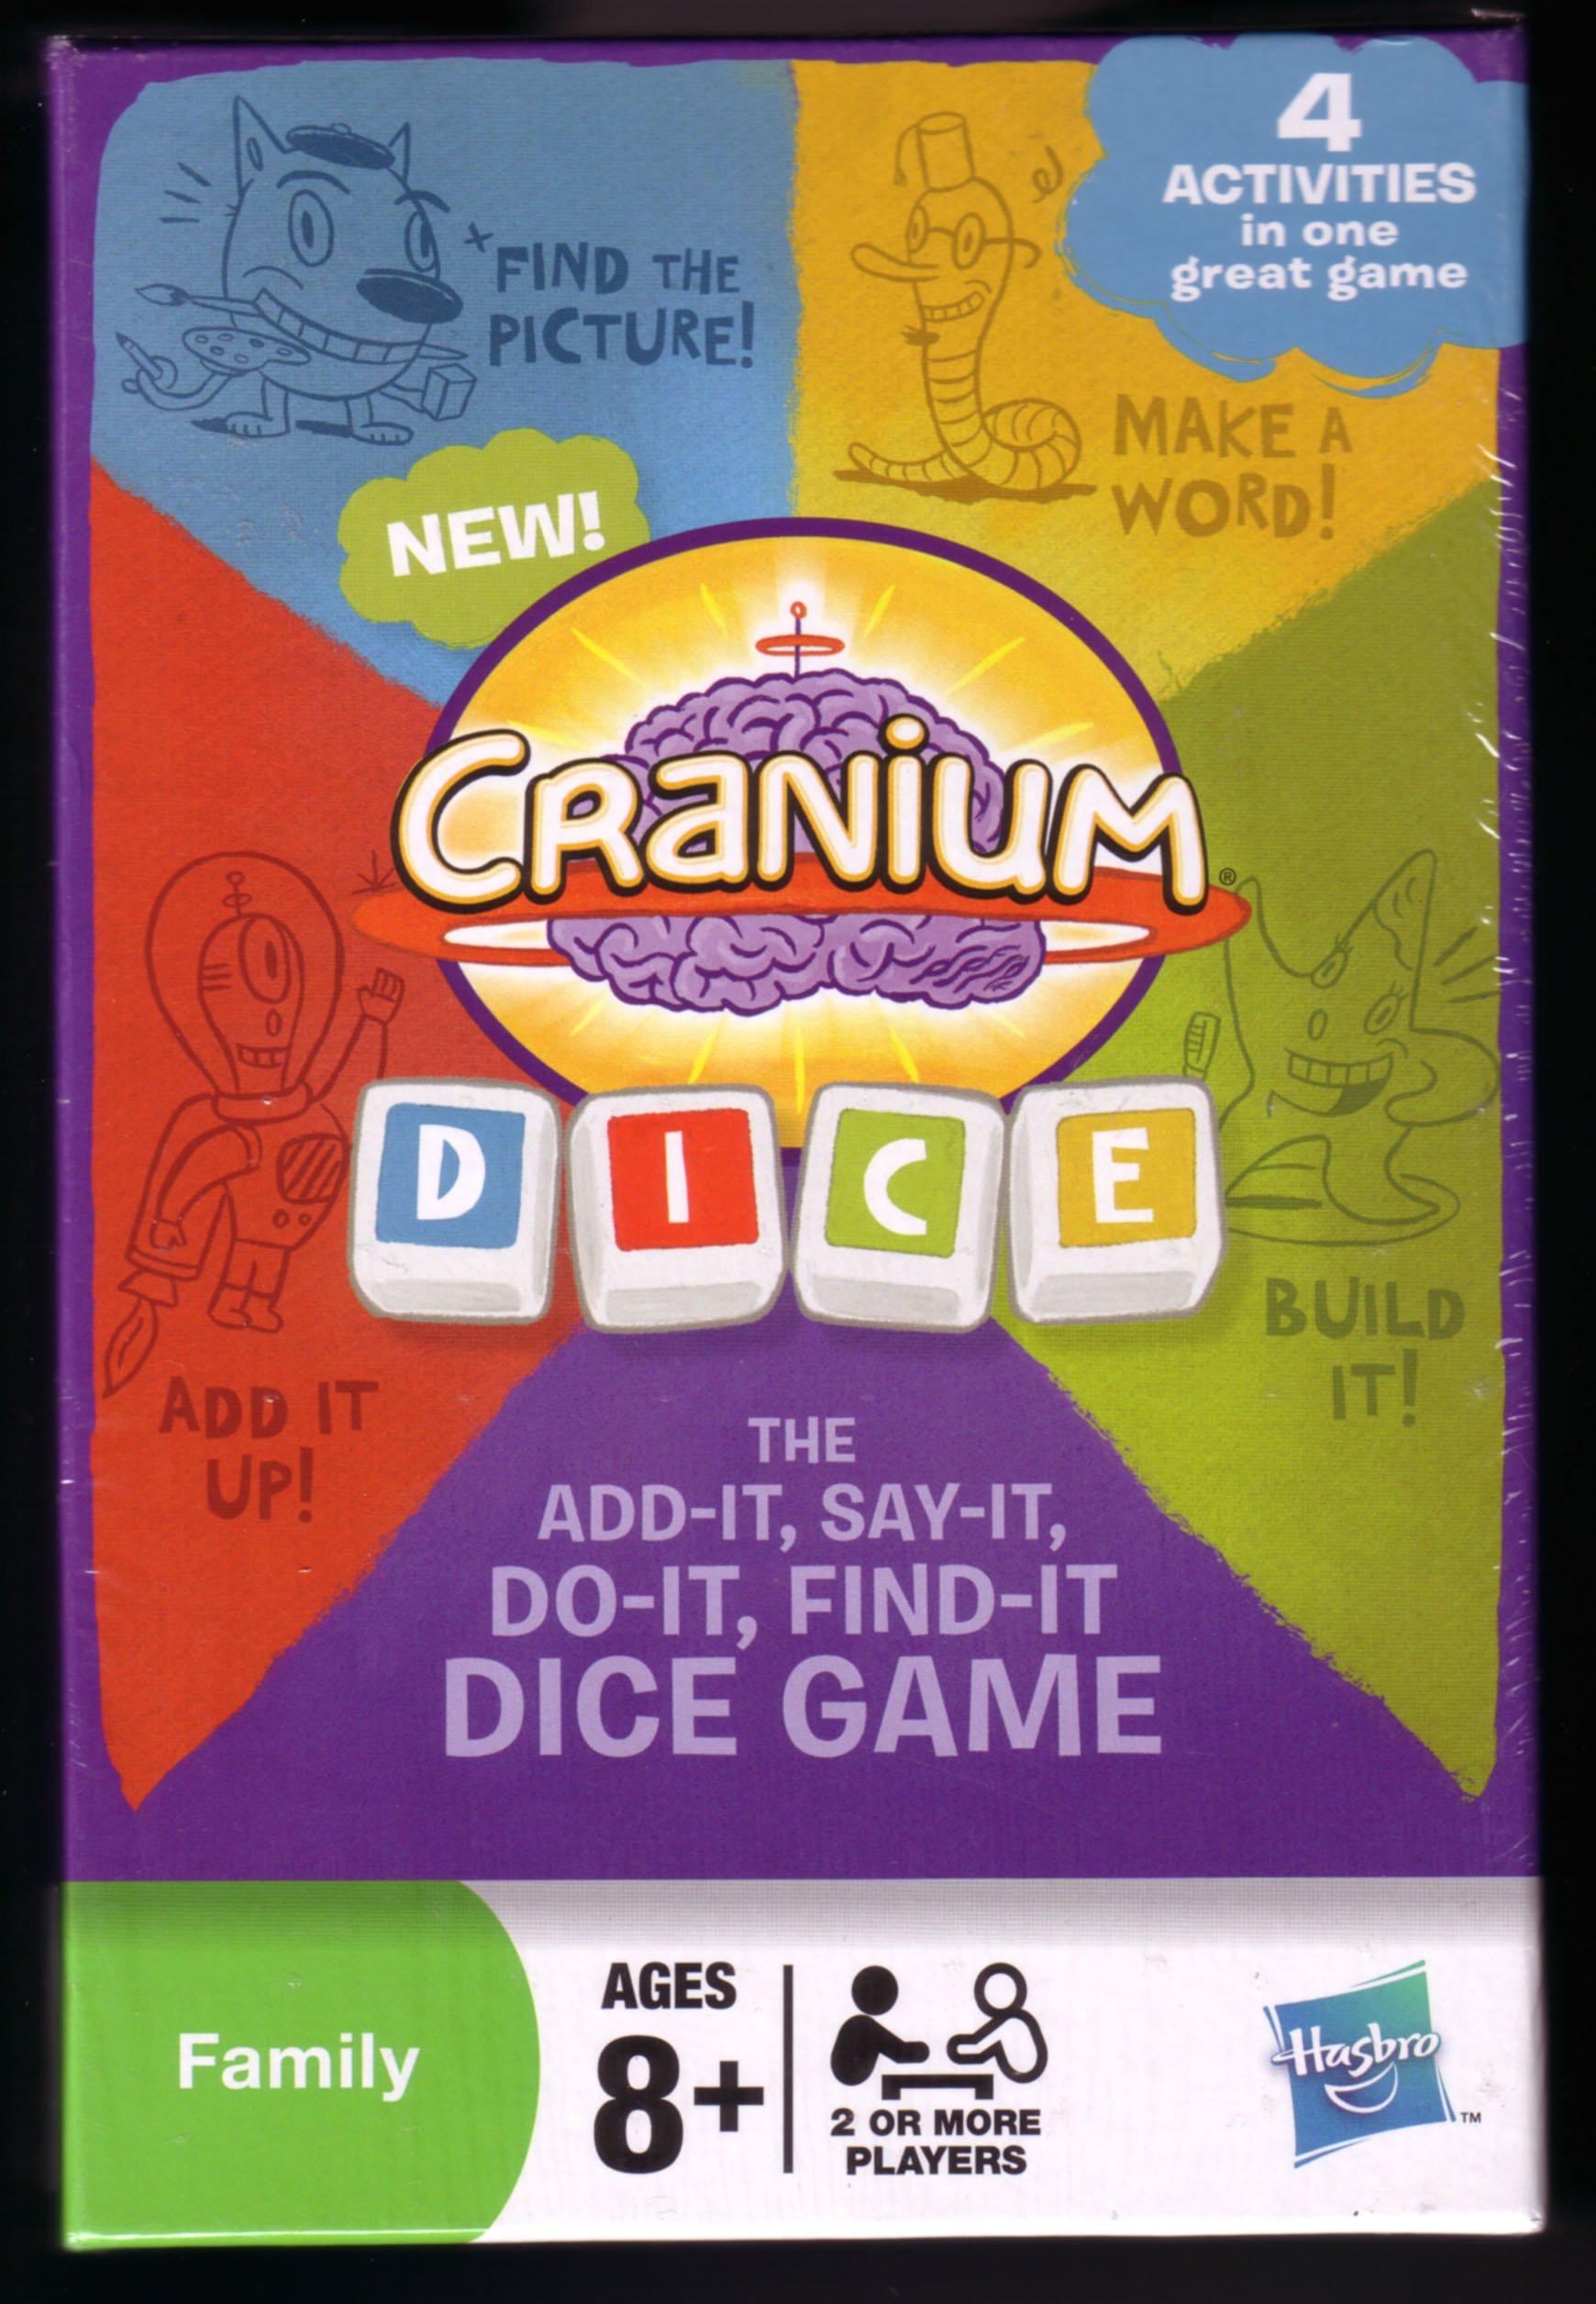 Cranium Dice: The Add-It, Say-It, Do-It, Find-It Dice Game